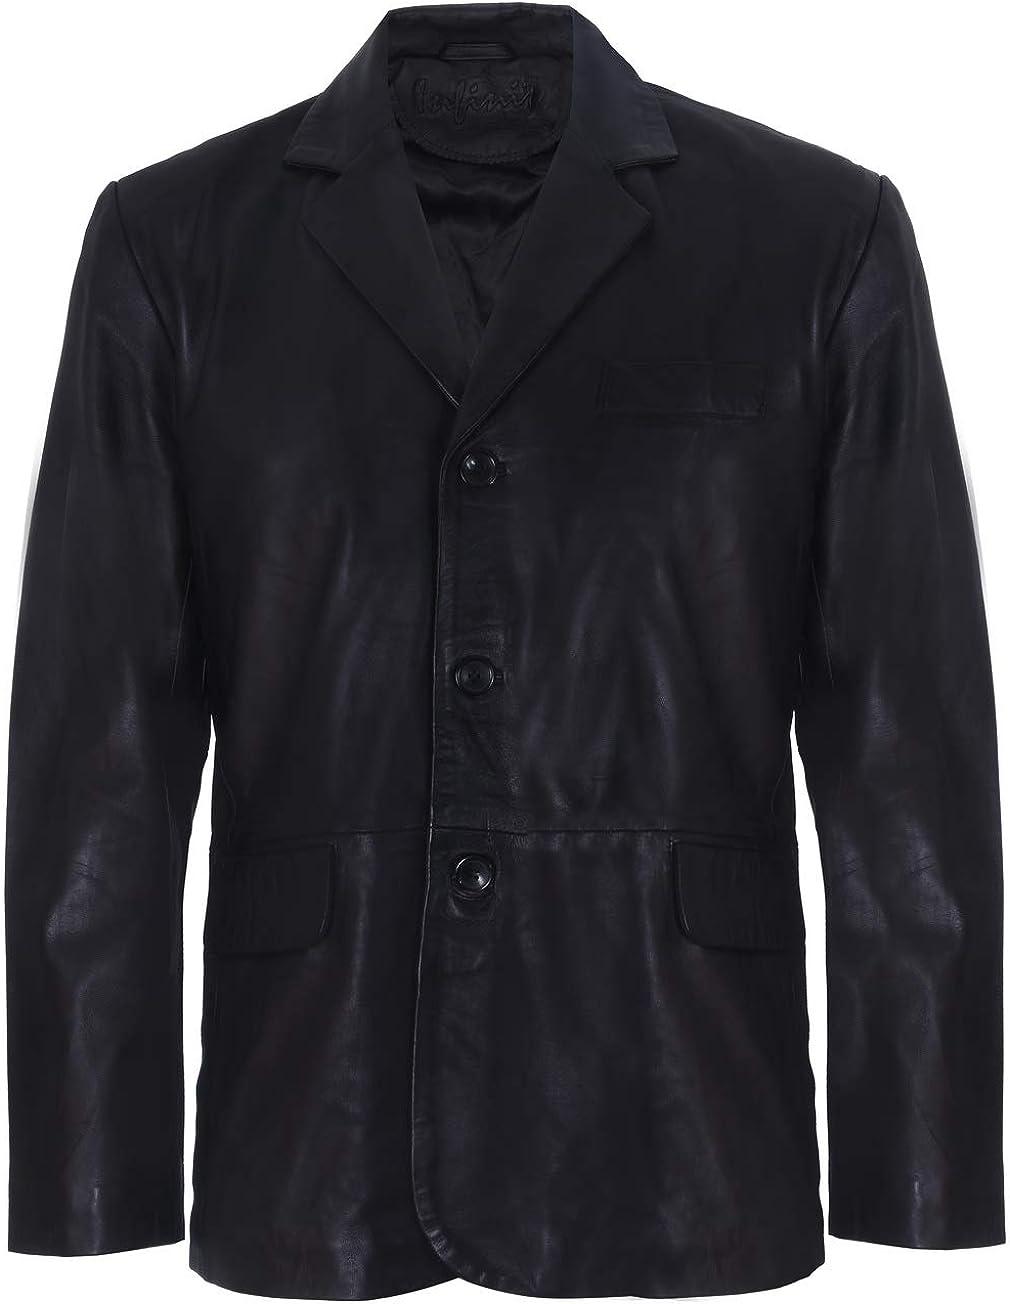 Men's Smart Black Tailored Fit 3 Button Single Breasted Blazer Jacket